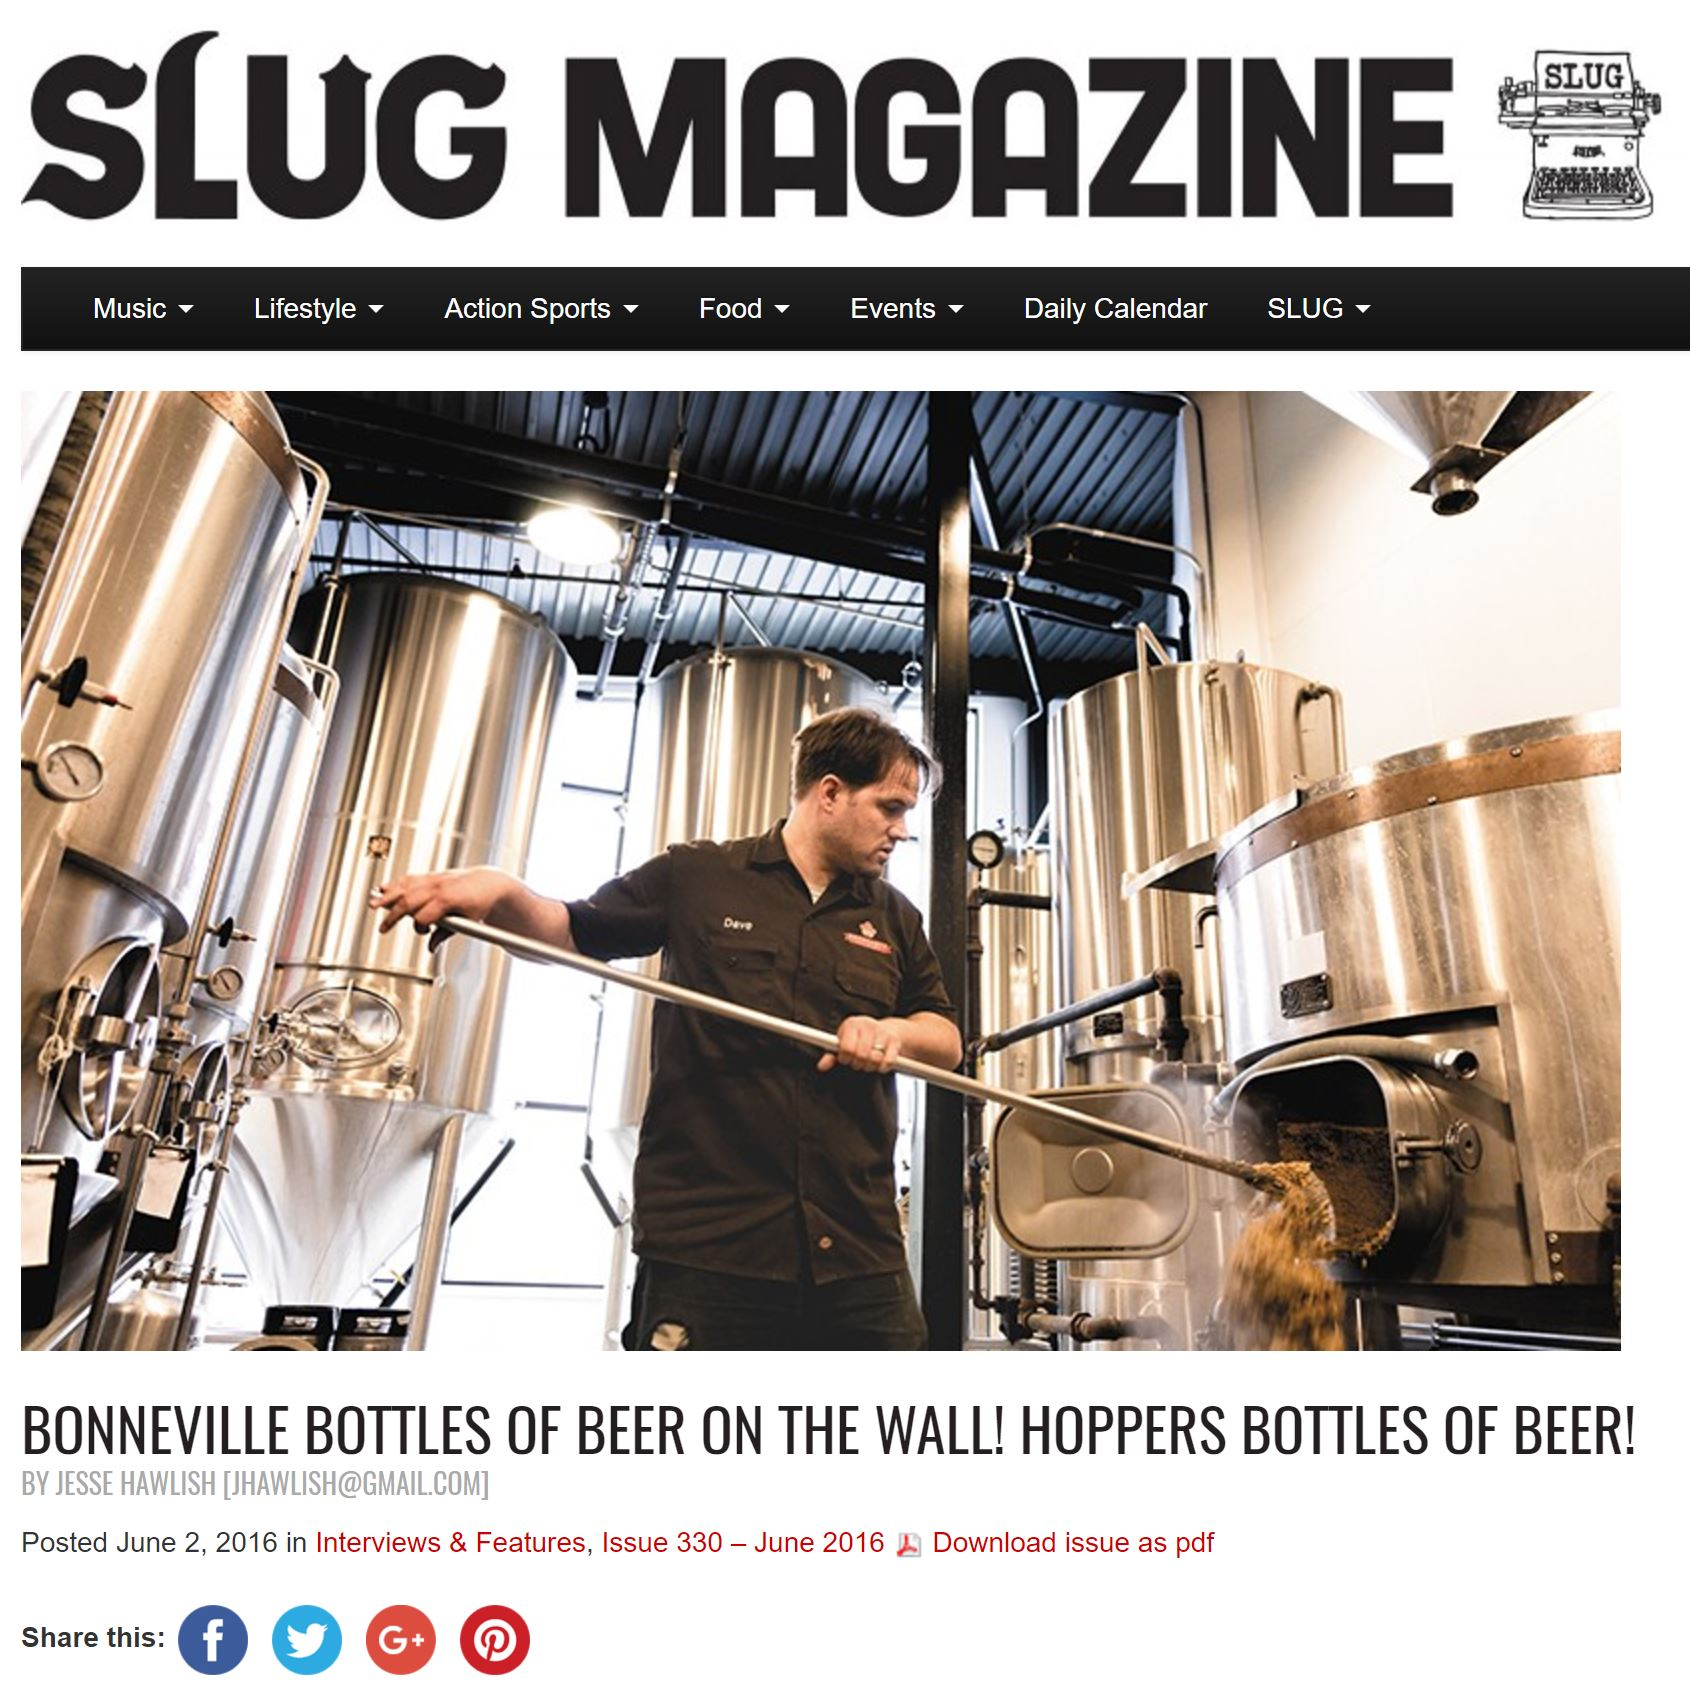 http://www.slugmag.com/interviews-features/bonneville-bottles-beer-wall-hoppers-bottles-beer/